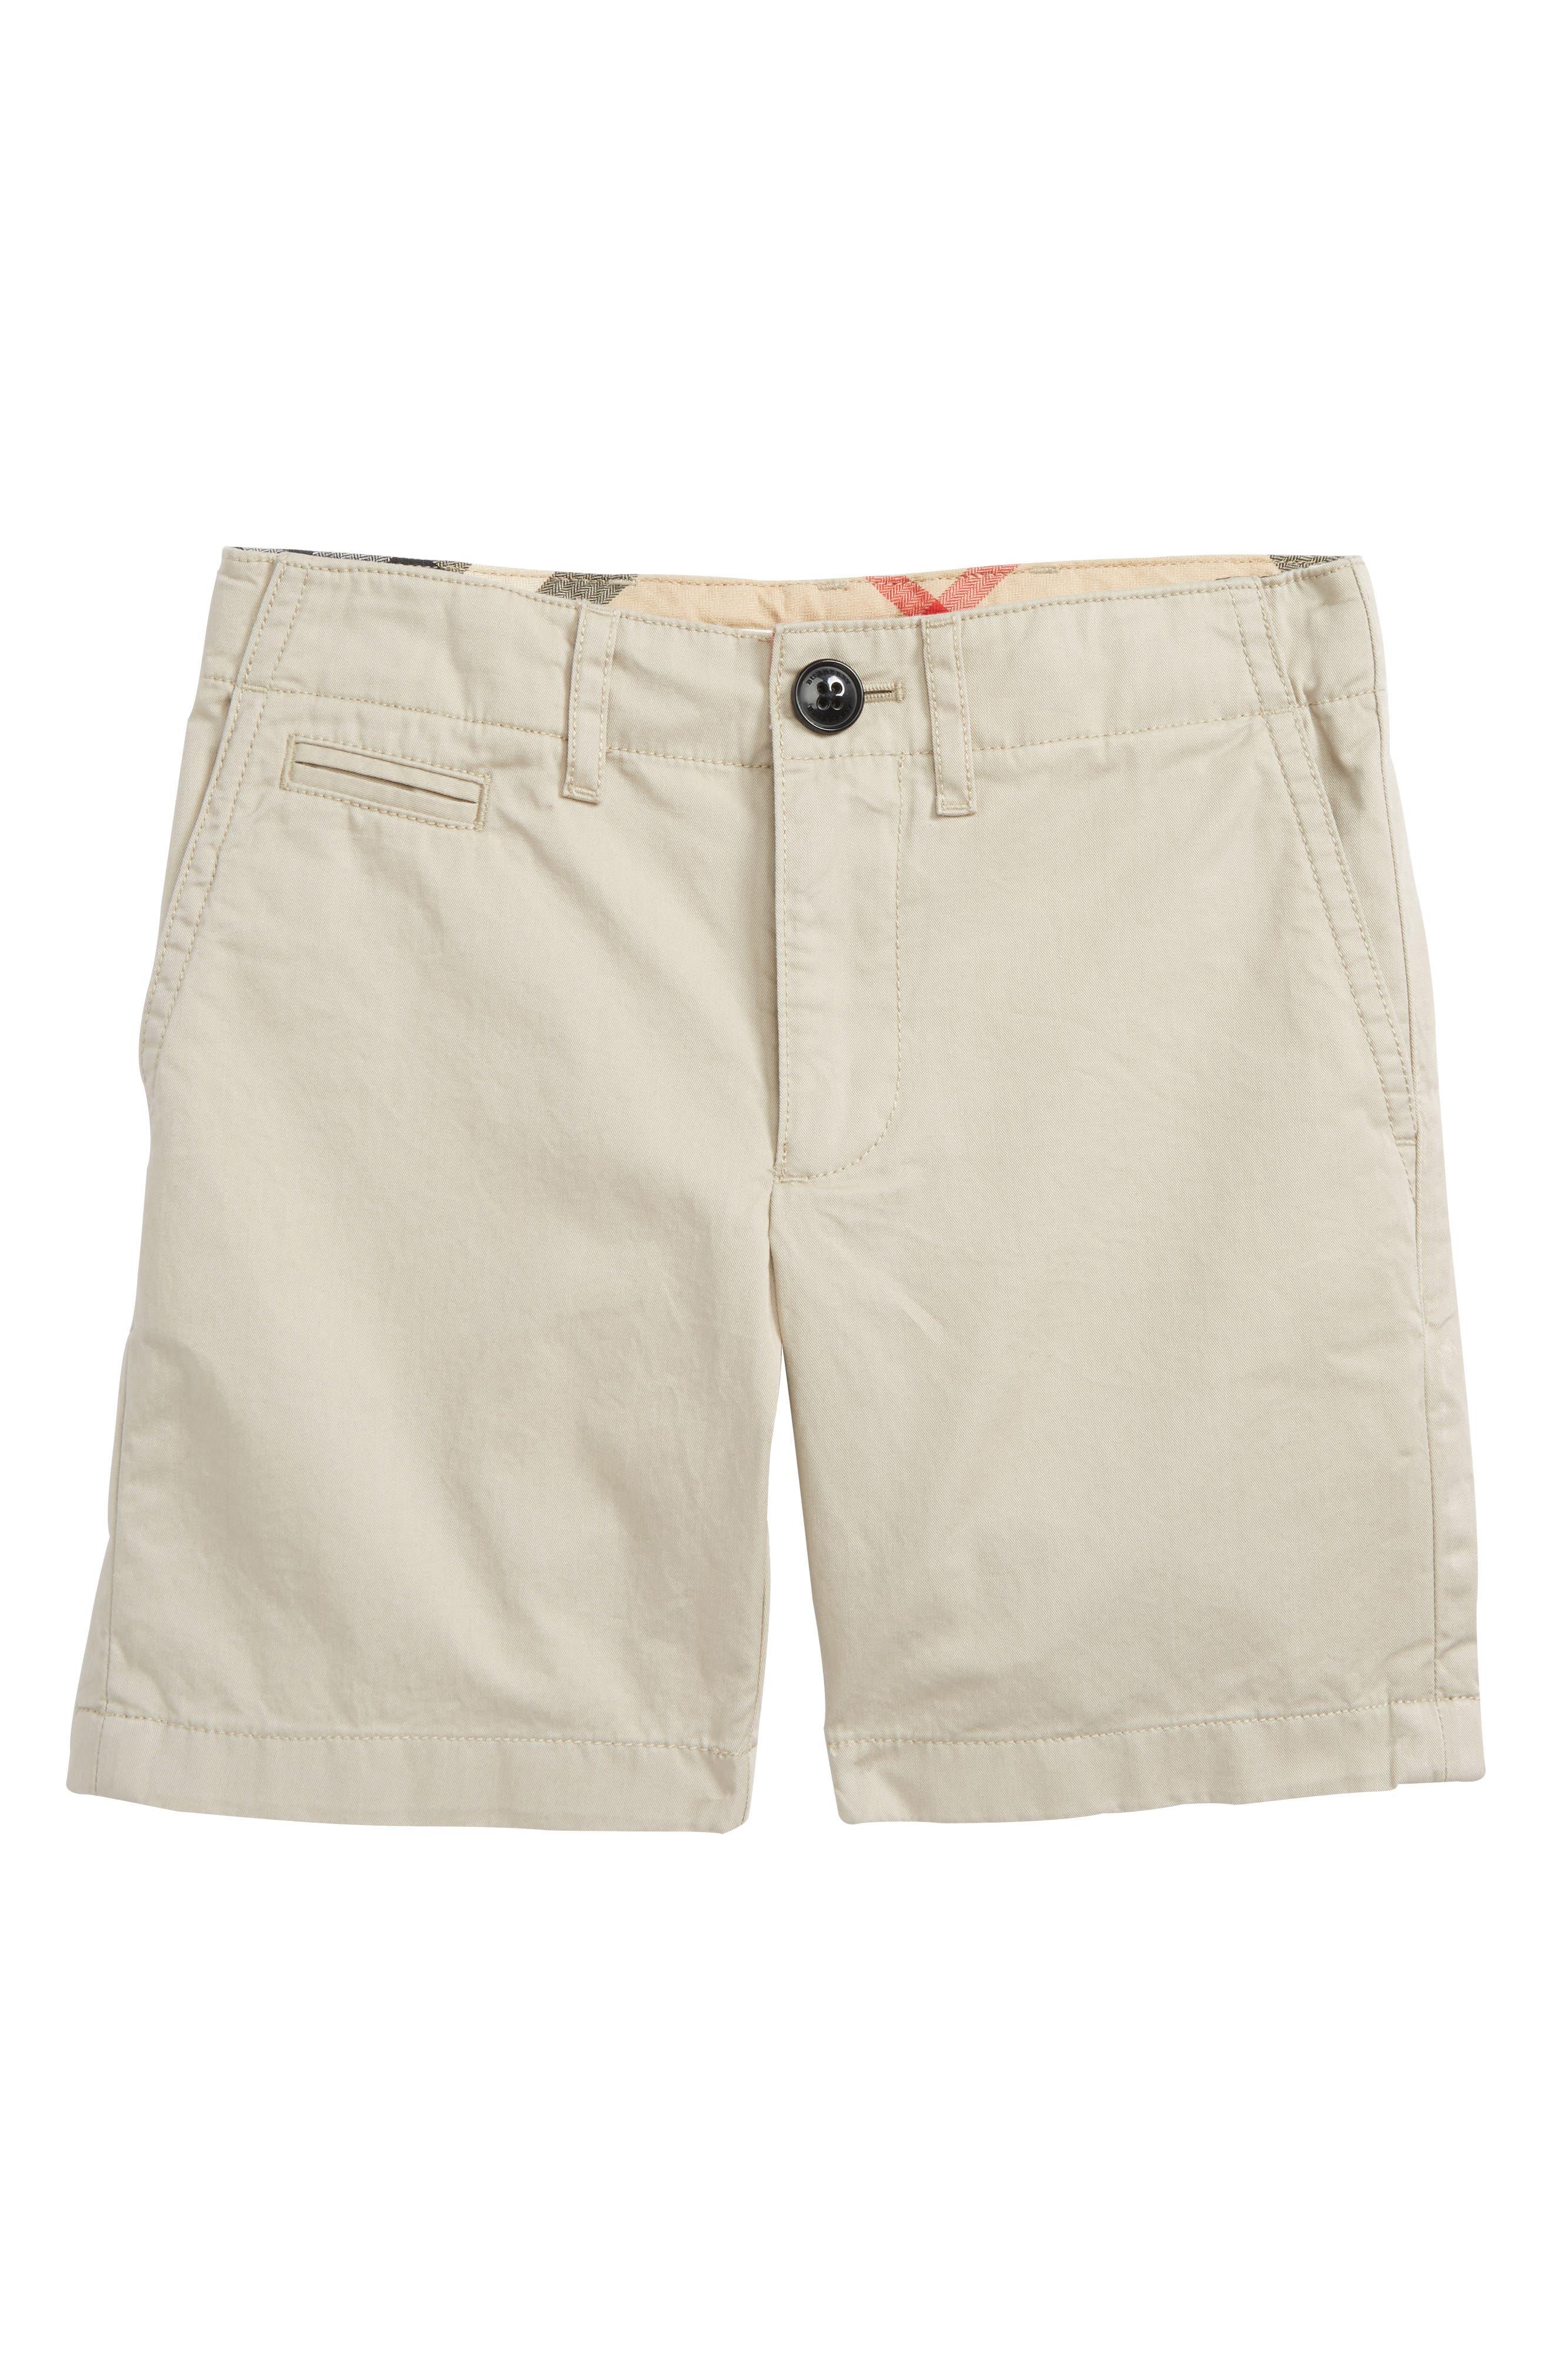 Alternate Image 1 Selected - Burberry Tristen Shorts (Little Boys & Big Boys)